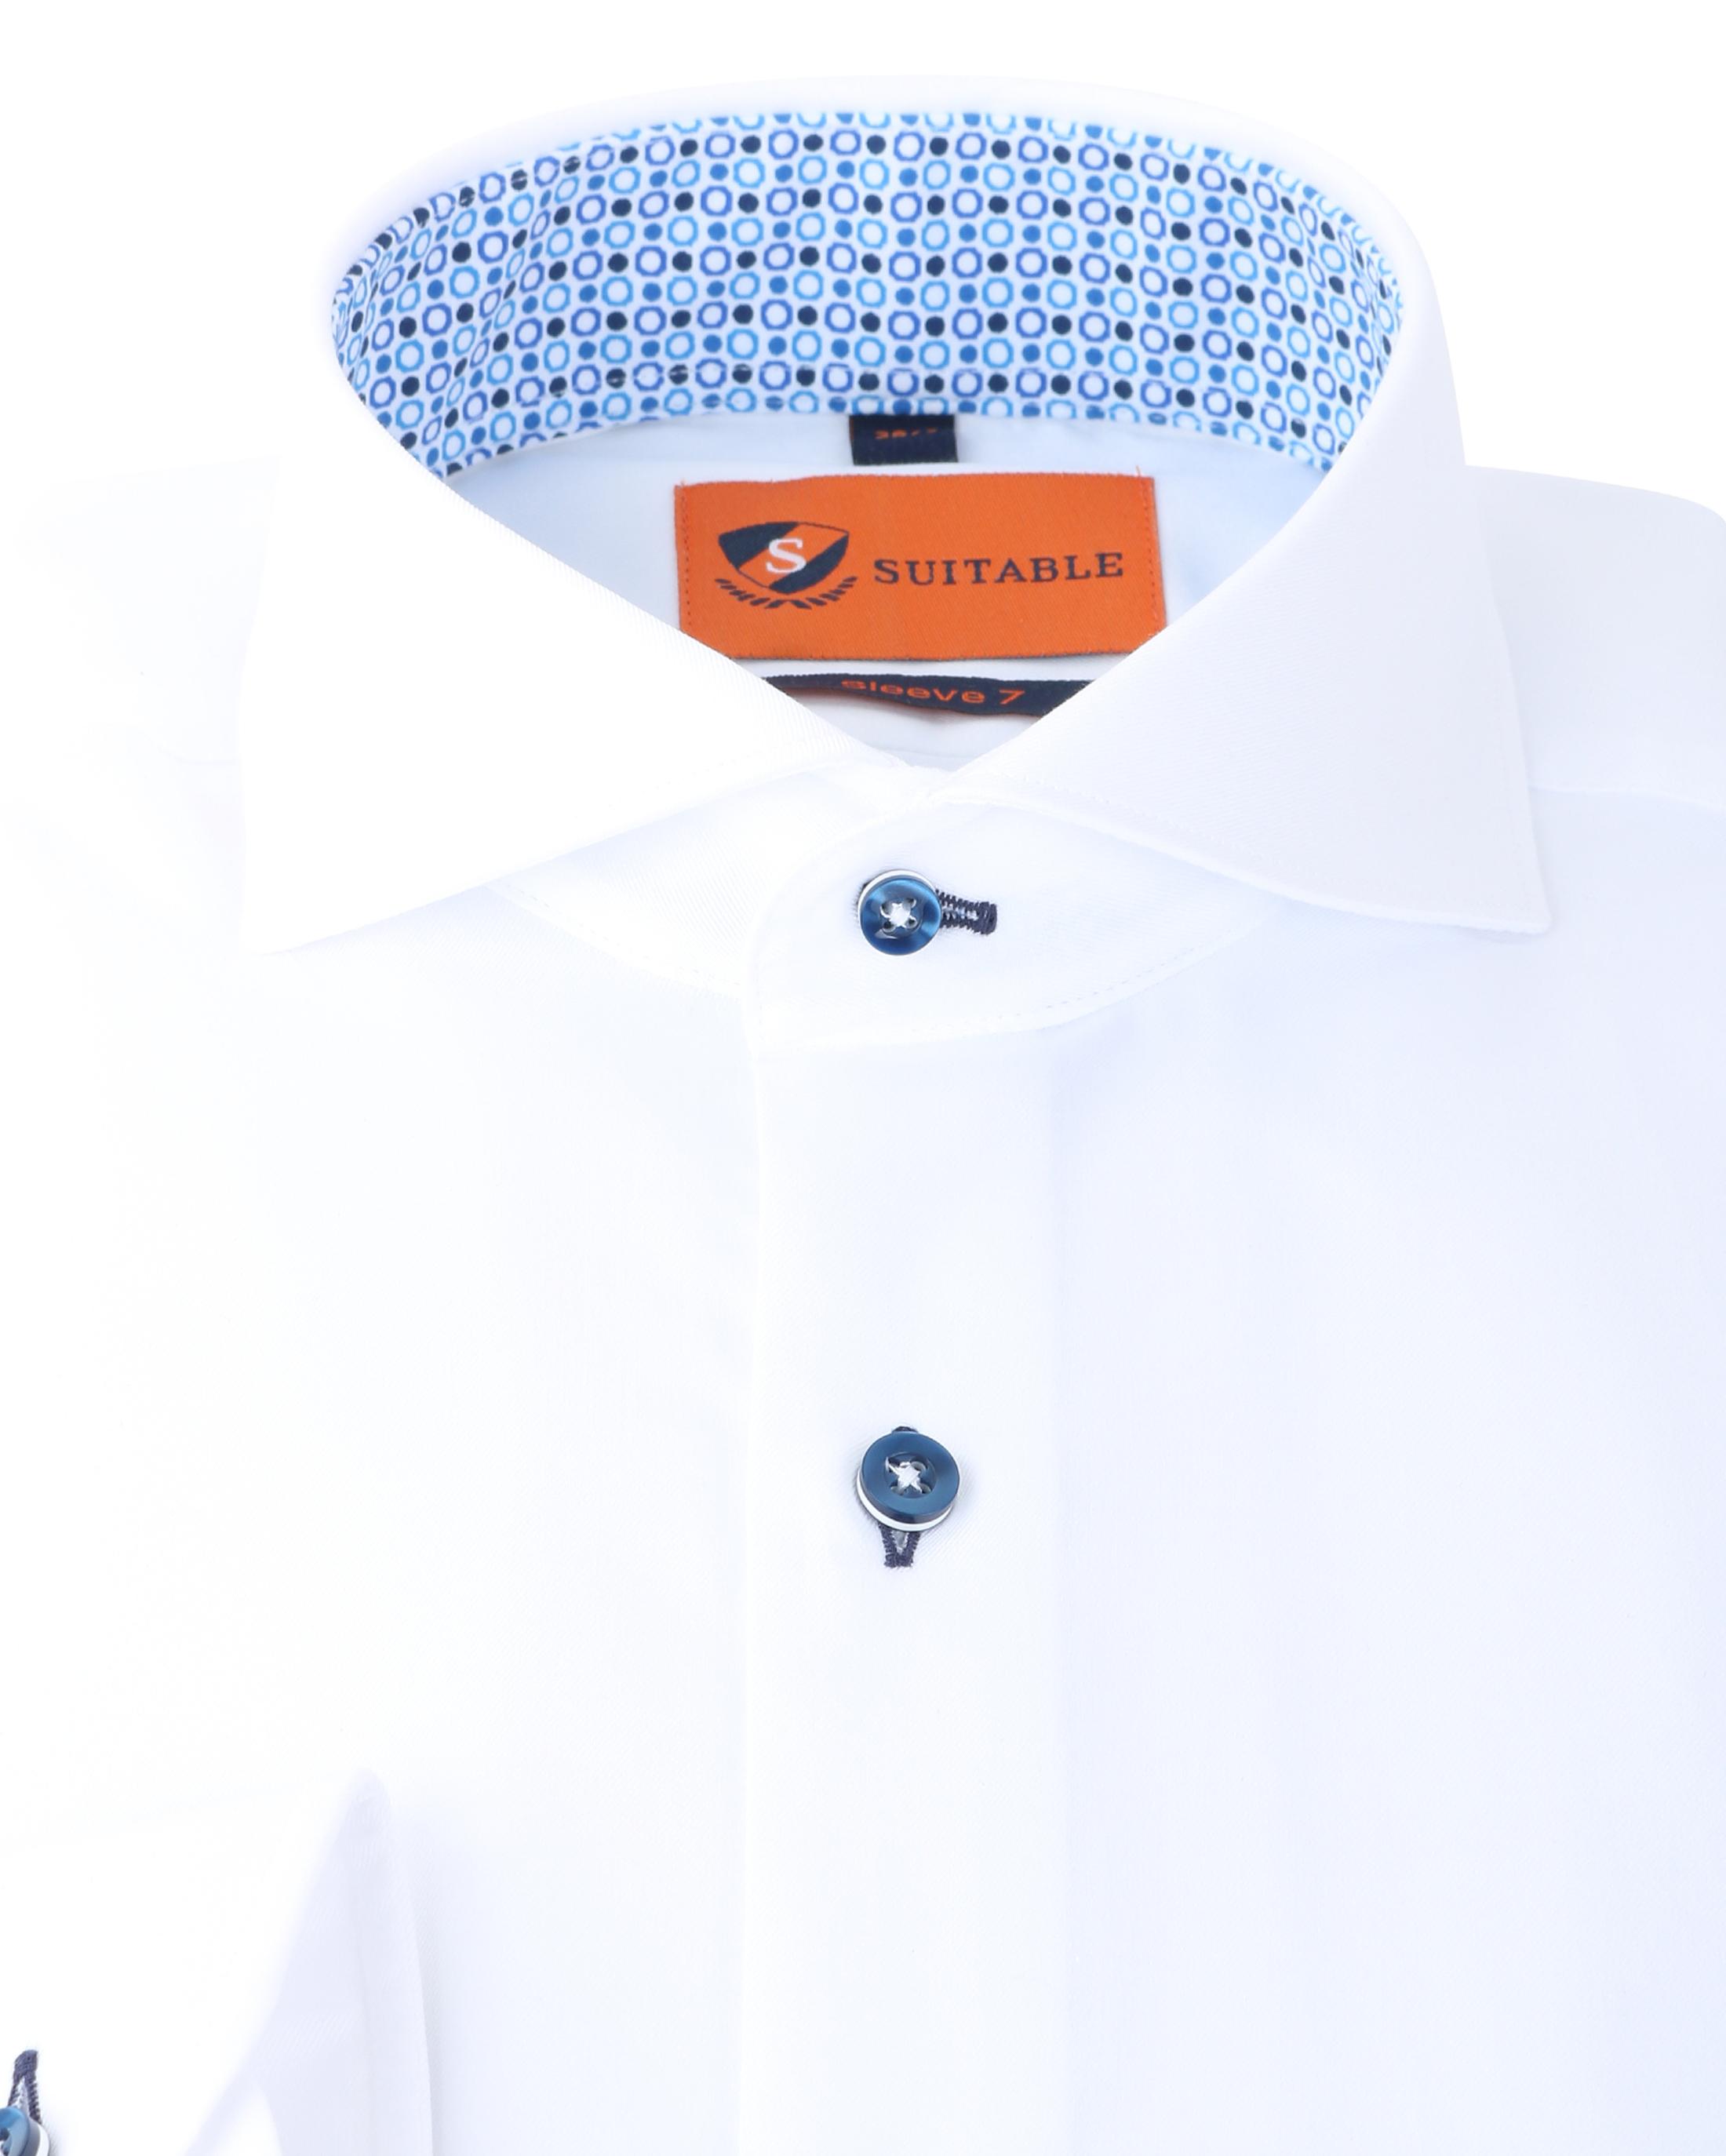 Suitable Overhemd SL7 Wit 140-1 foto 1